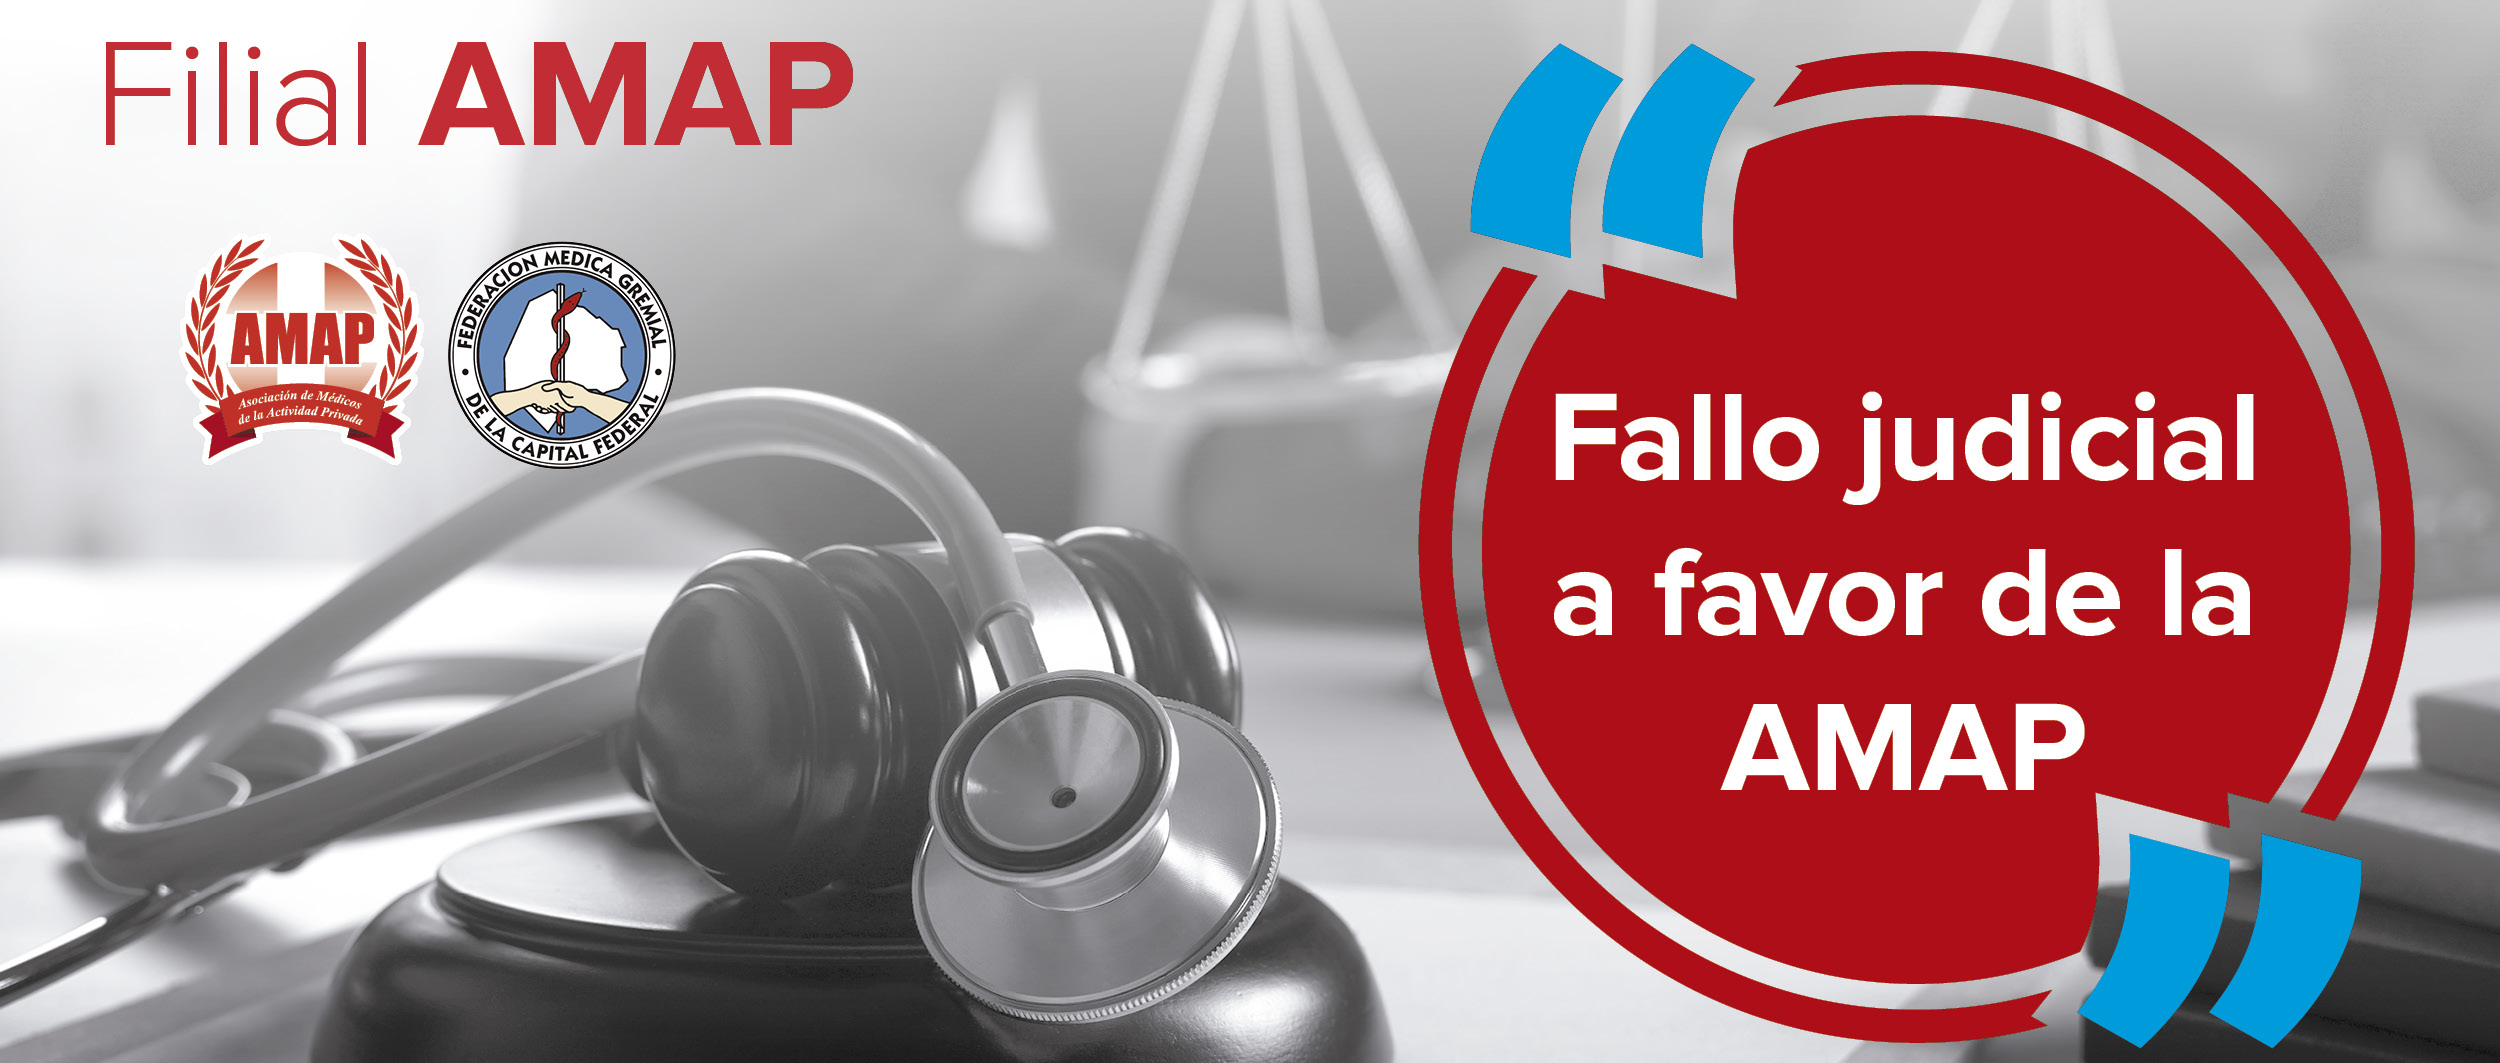 Fallo judicial obliga al Hospital Español a reincorporar a una dirigente de la AMAP